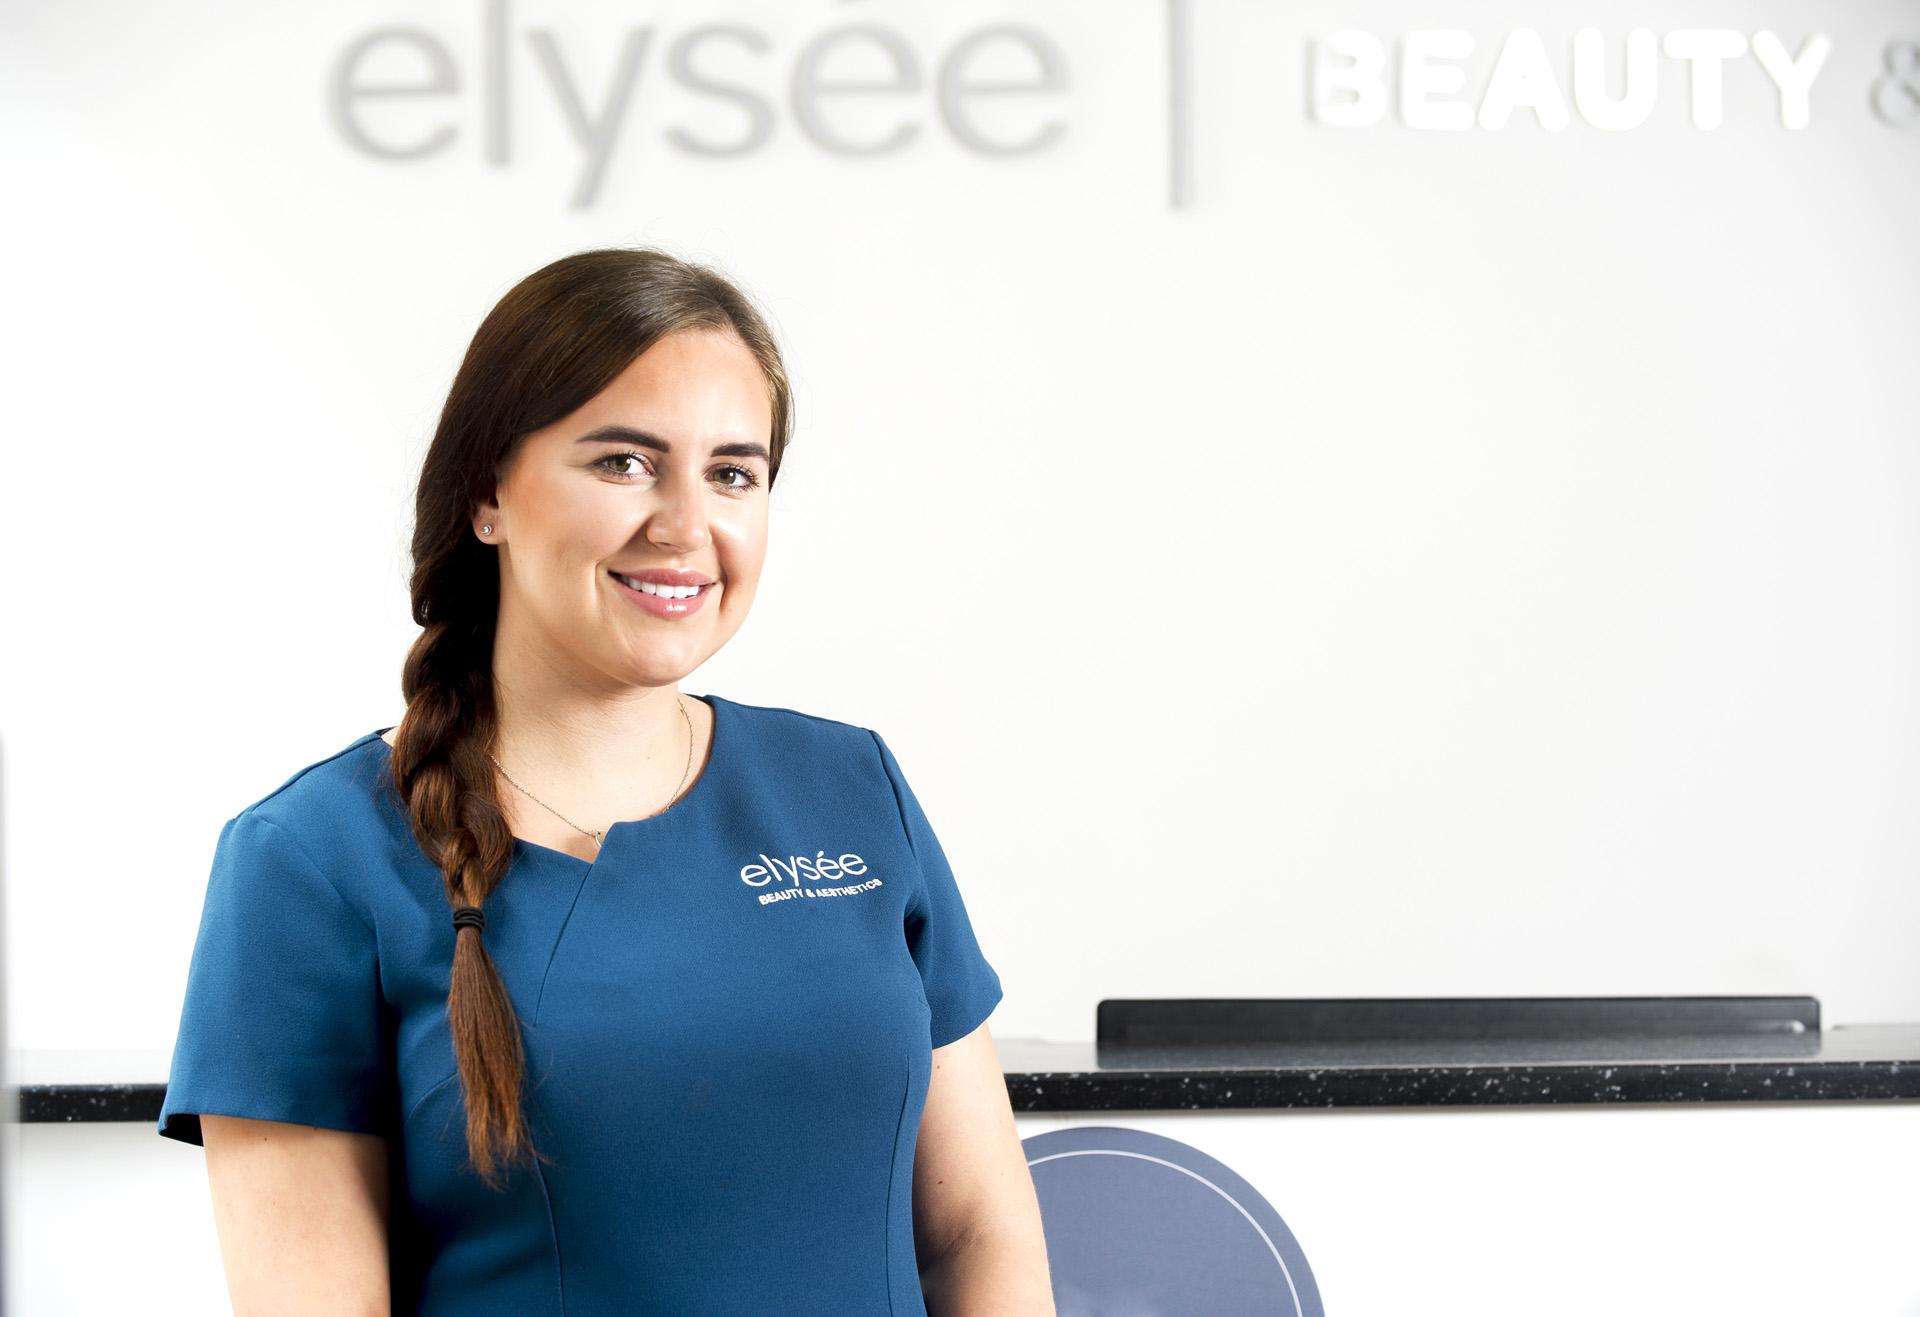 ELLA - SALON ELYSEE BEAUTY & AESTHETICS